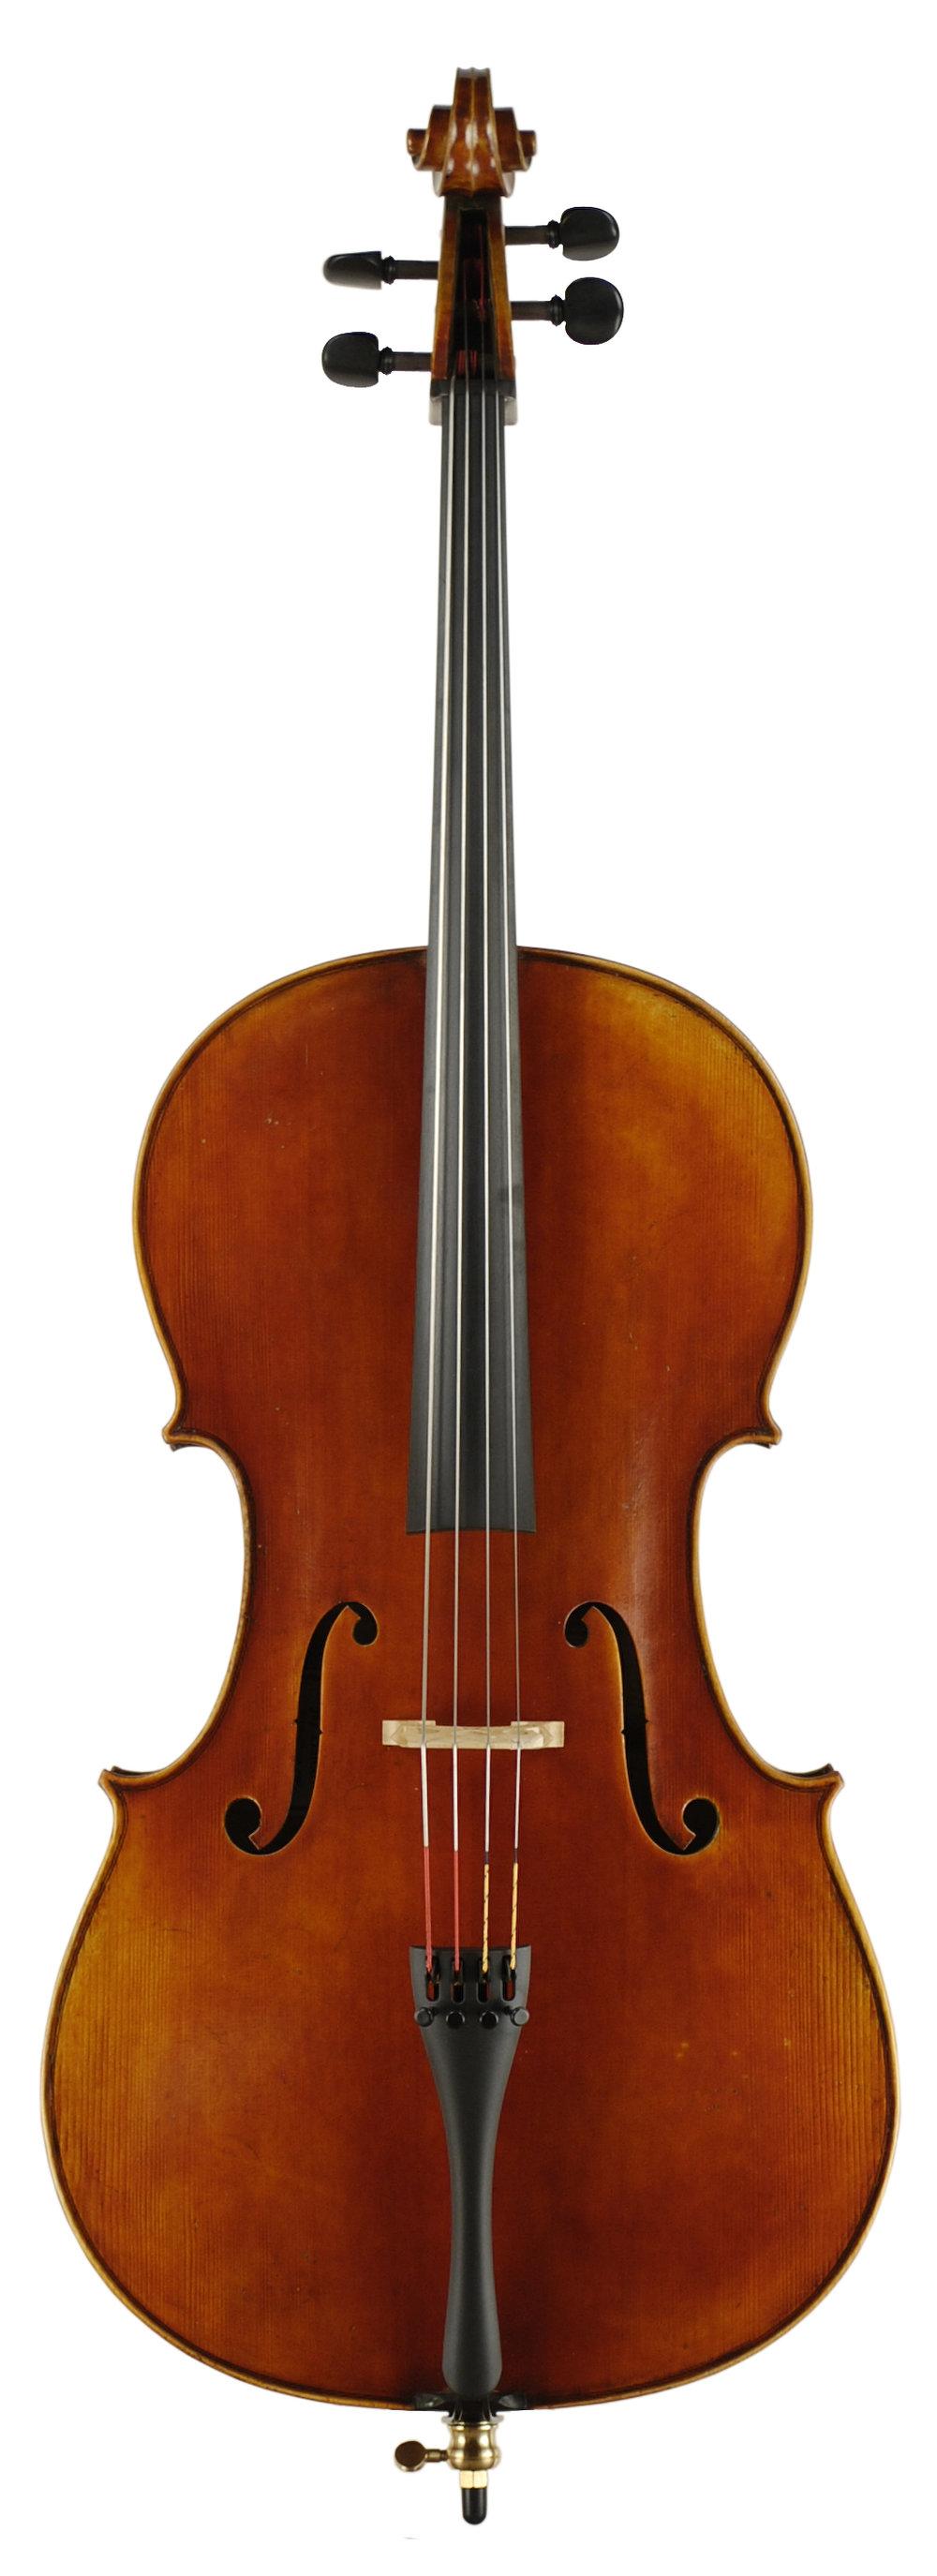 Jay Haide l'ancienne Cello